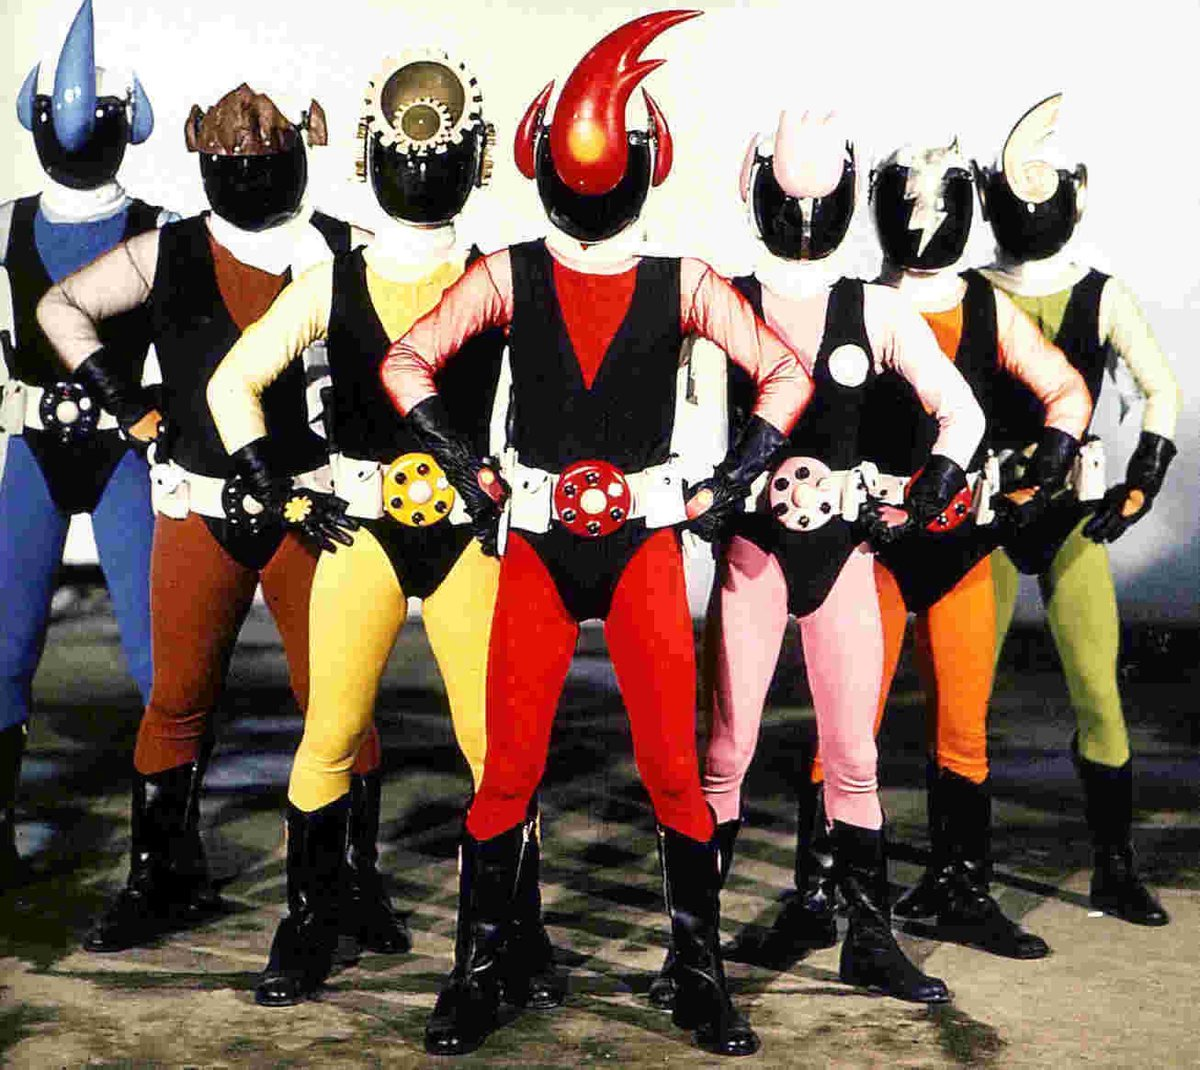 nipponico sesso Ninja gay sesso ed